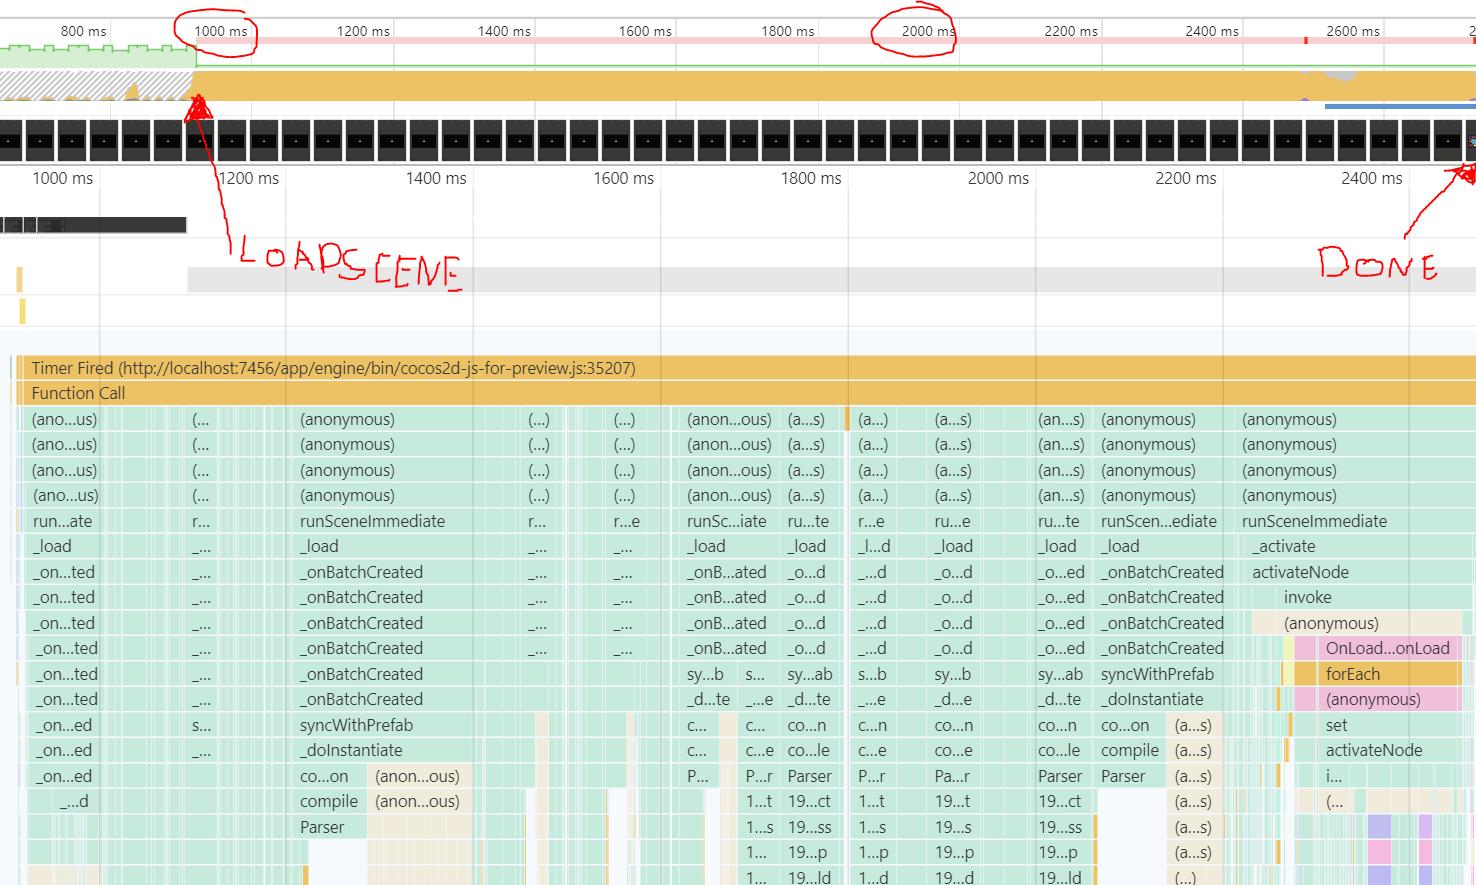 cc director loadScene Freezes game when loading big scene - Cocos